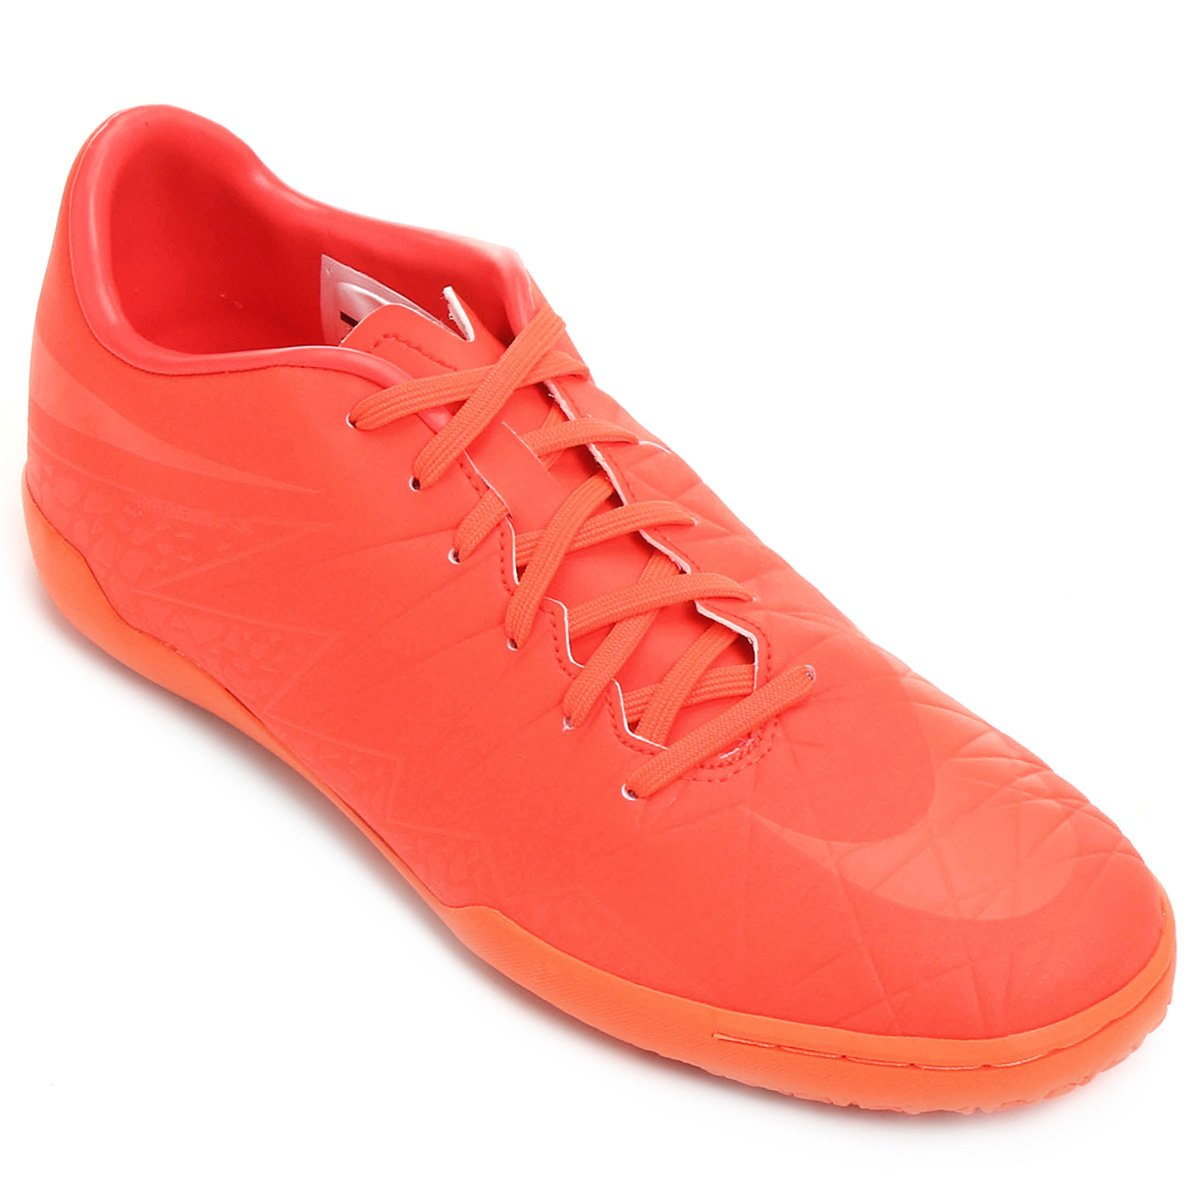 e58284ead7 Chuteira Futsal Nike Hypervenom Phelon 2 IC Masculina - Compre Agora ...